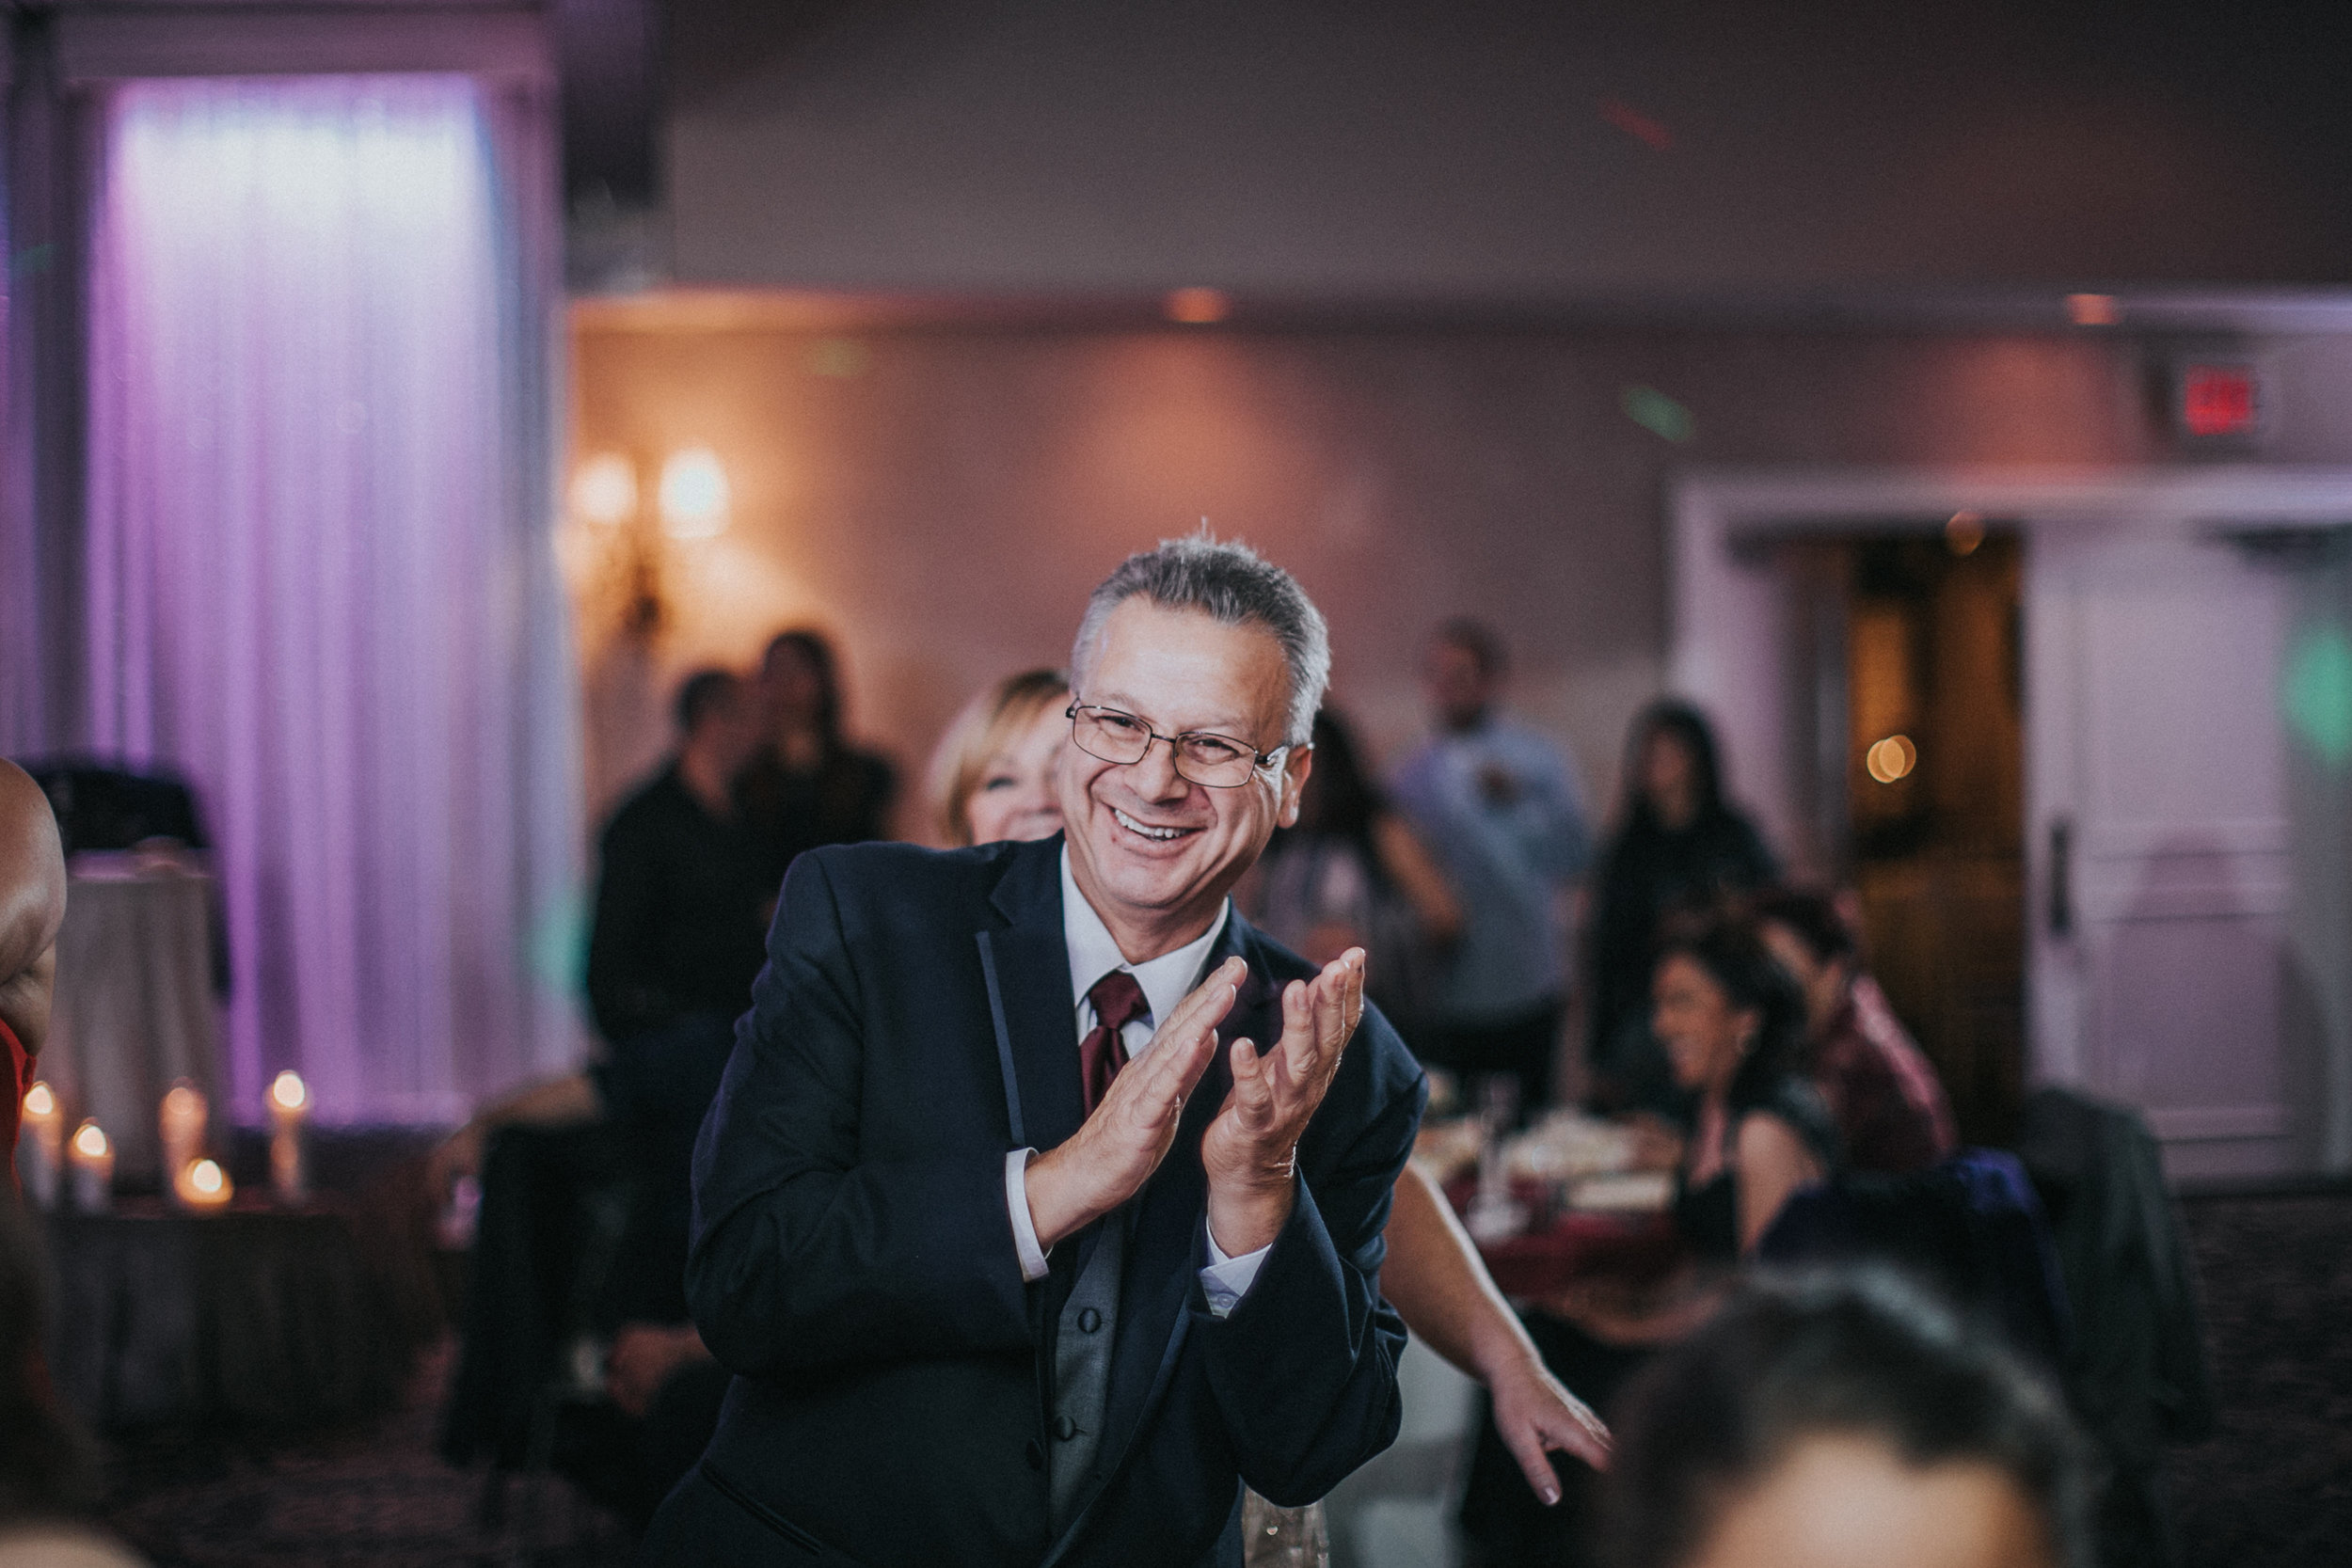 New-Jersey-Wedding-Photographer-ReceptionCenter-Valeria&Mike-Reception (103 of 265).jpg